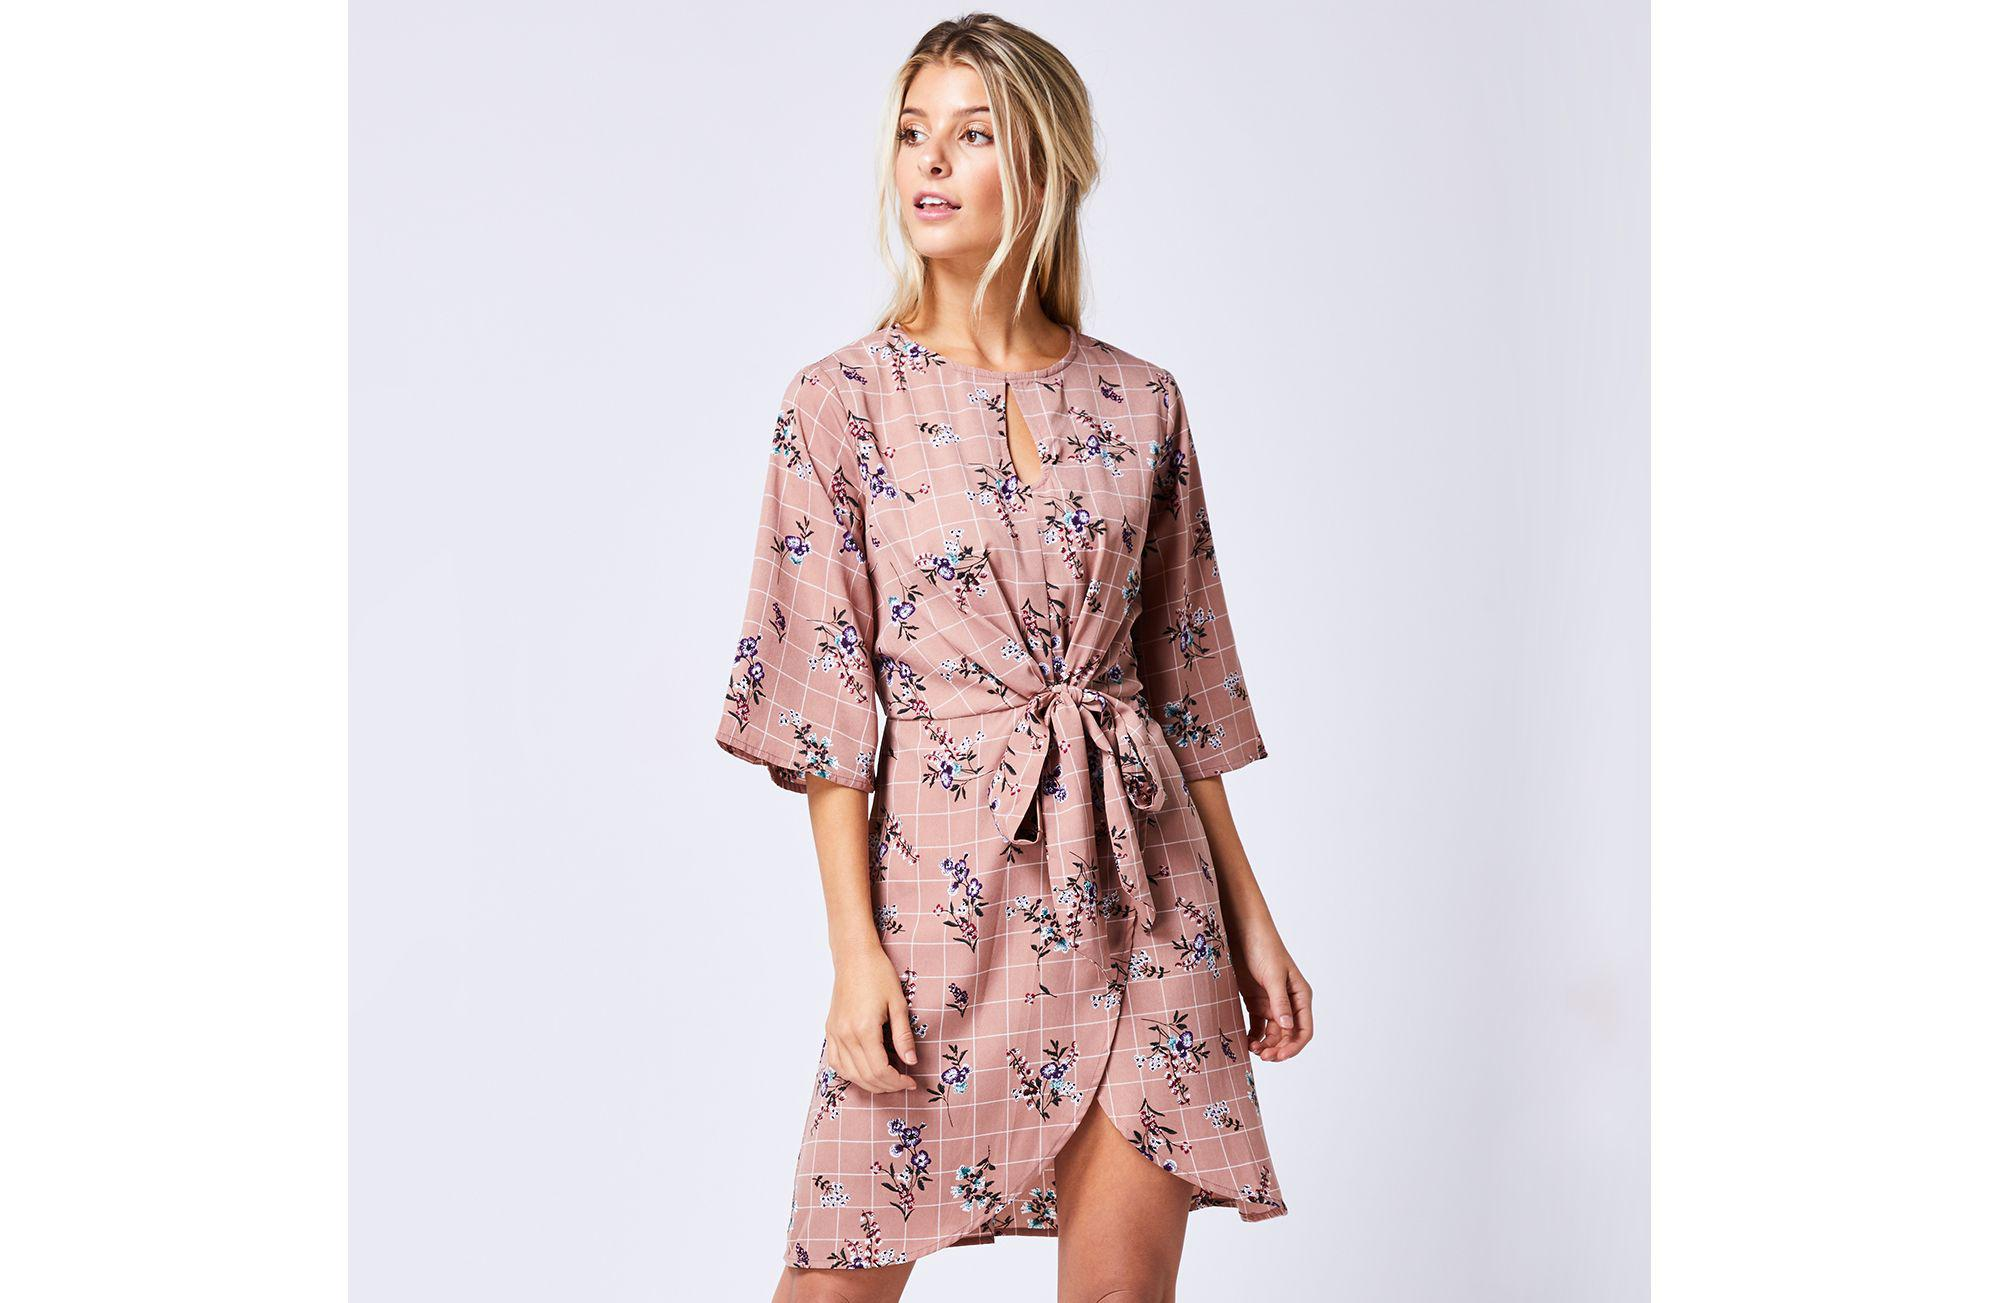 017e602fde08 Angeleye. Women's Nude Floaty Printed Floral Wrap Dress